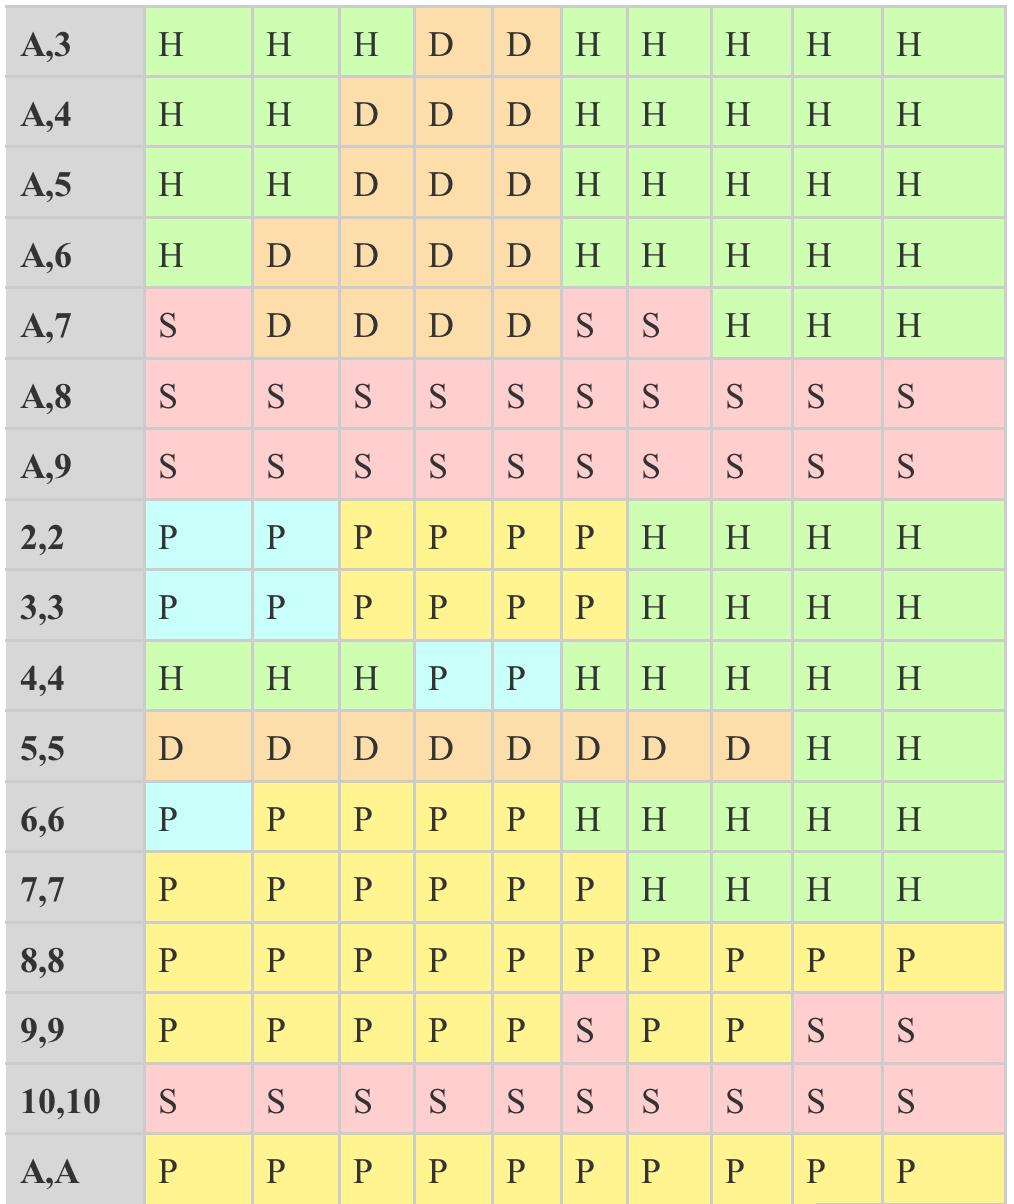 blackjack-cheat-sheet